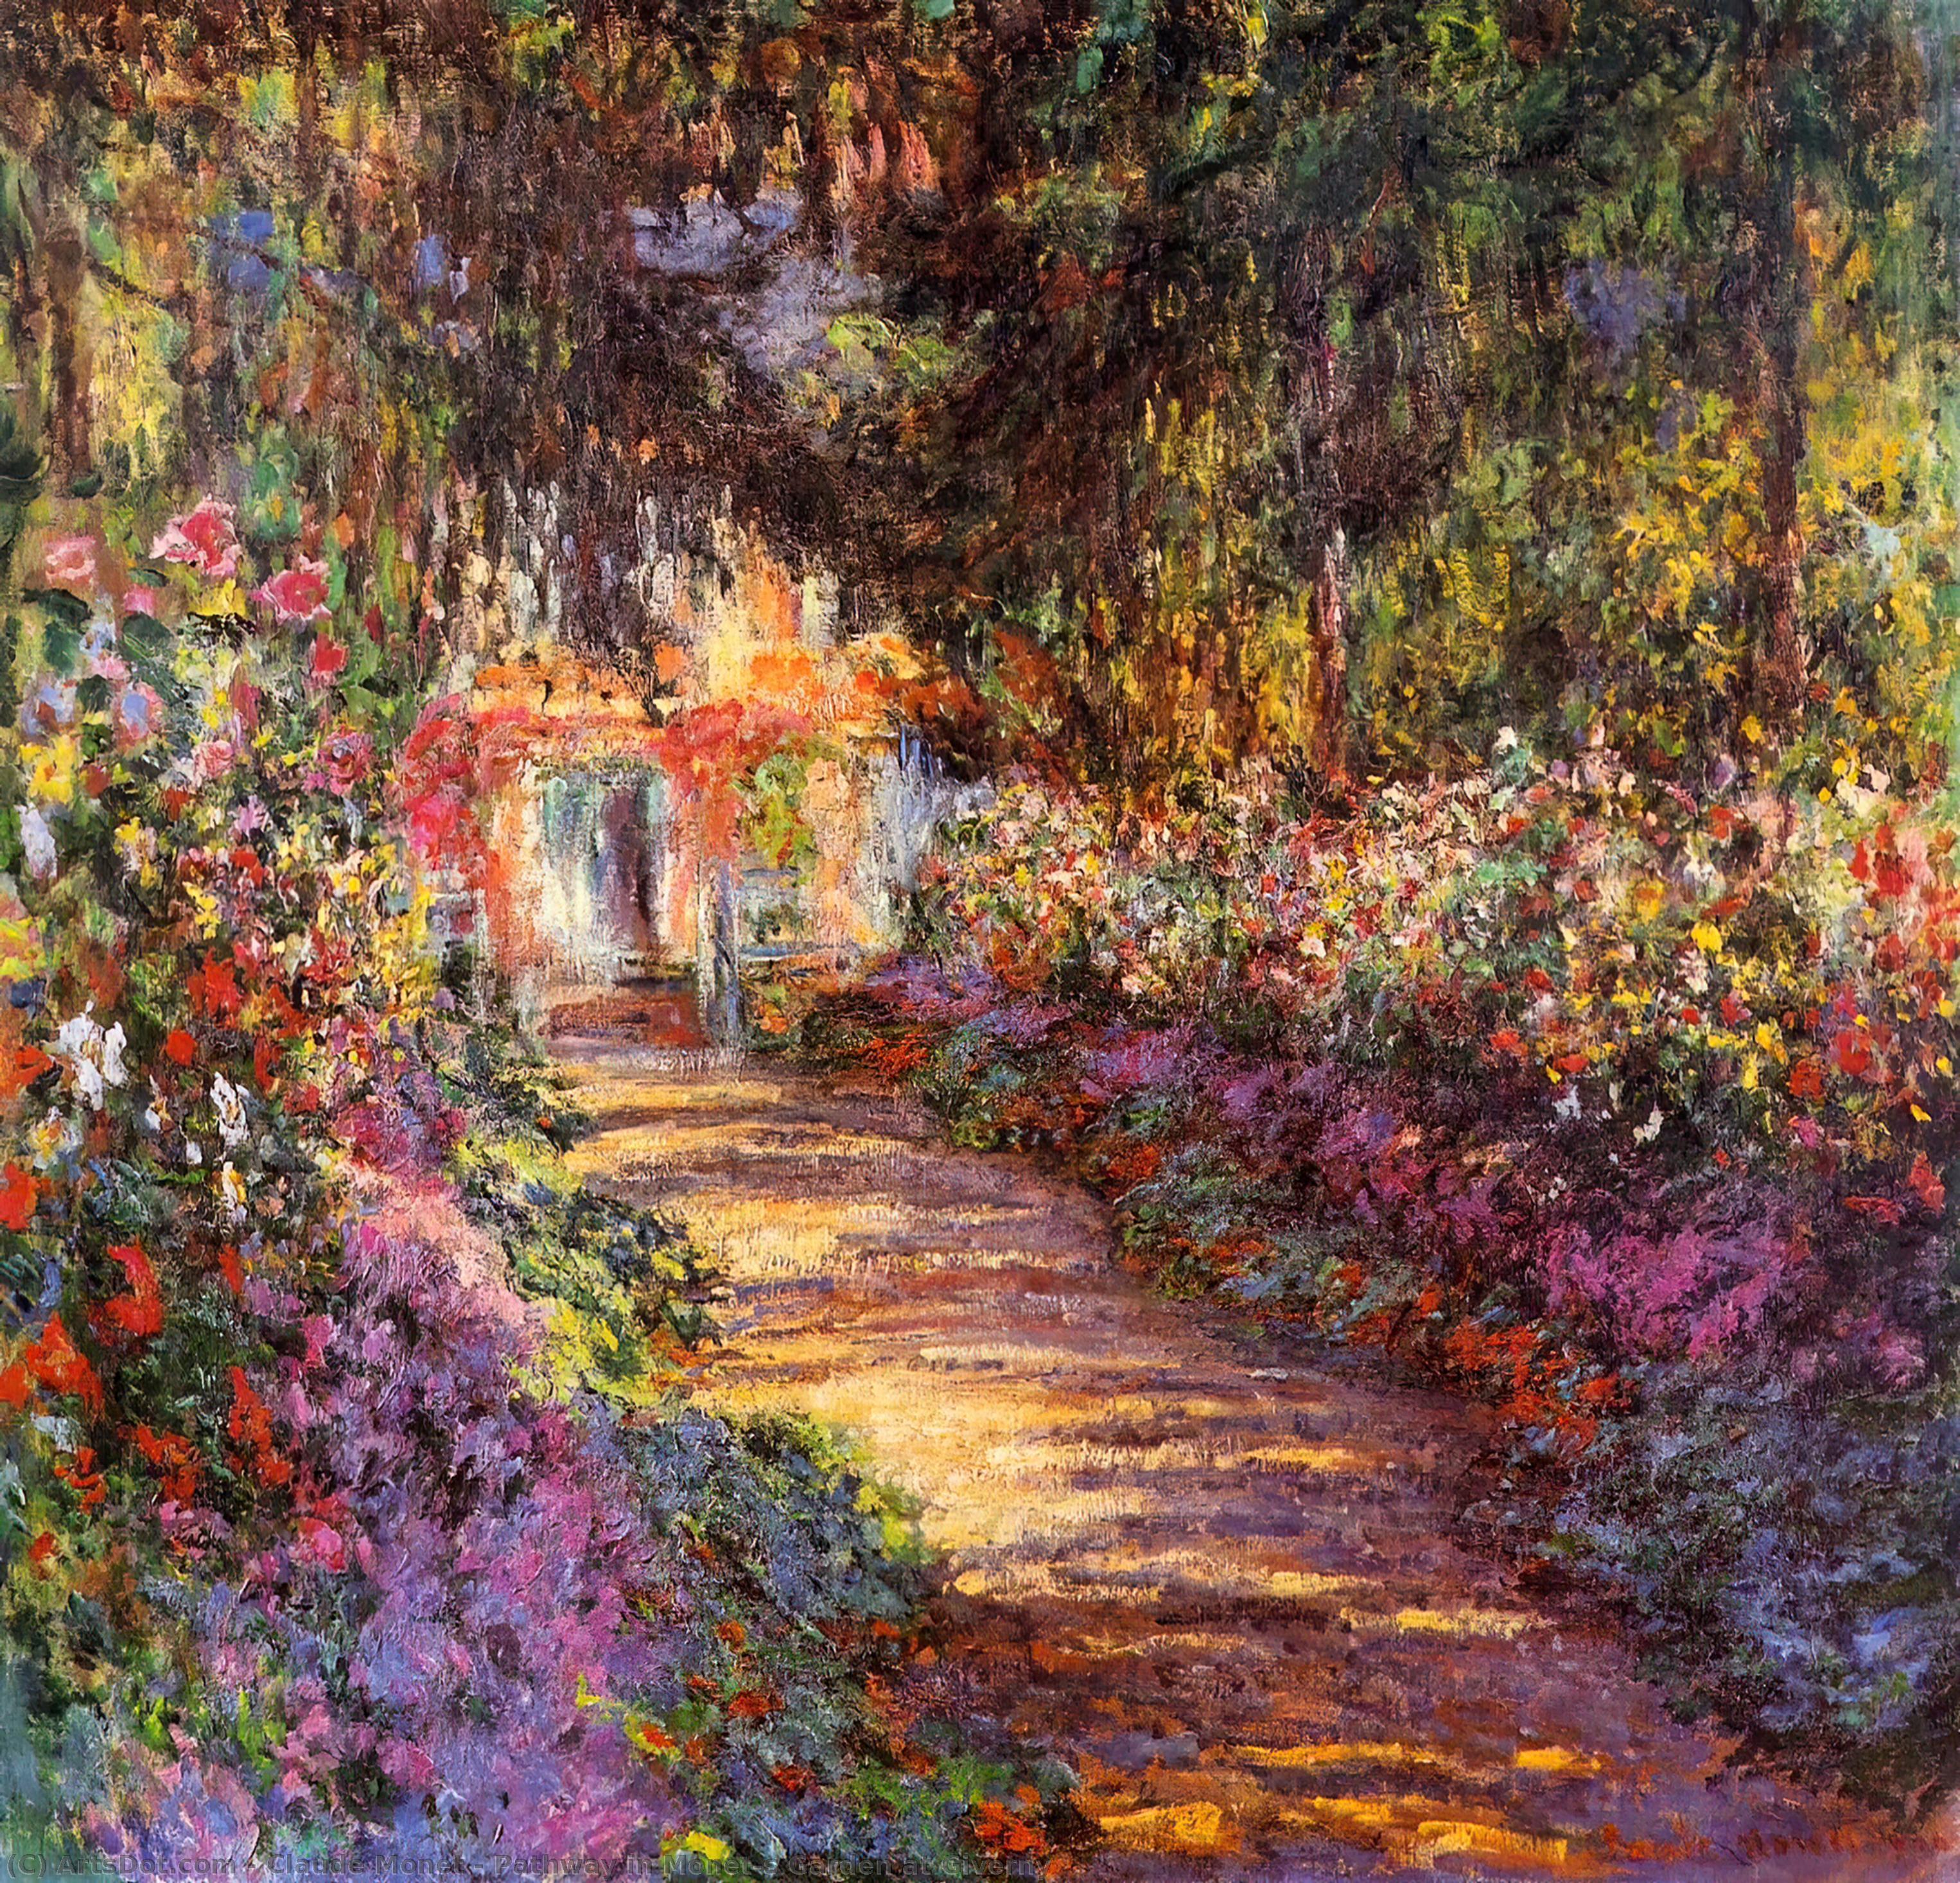 Wikoo.org - موسوعة الفنون الجميلة - اللوحة، العمل الفني Claude Monet - Pathway in Monet's Garden at Giverny